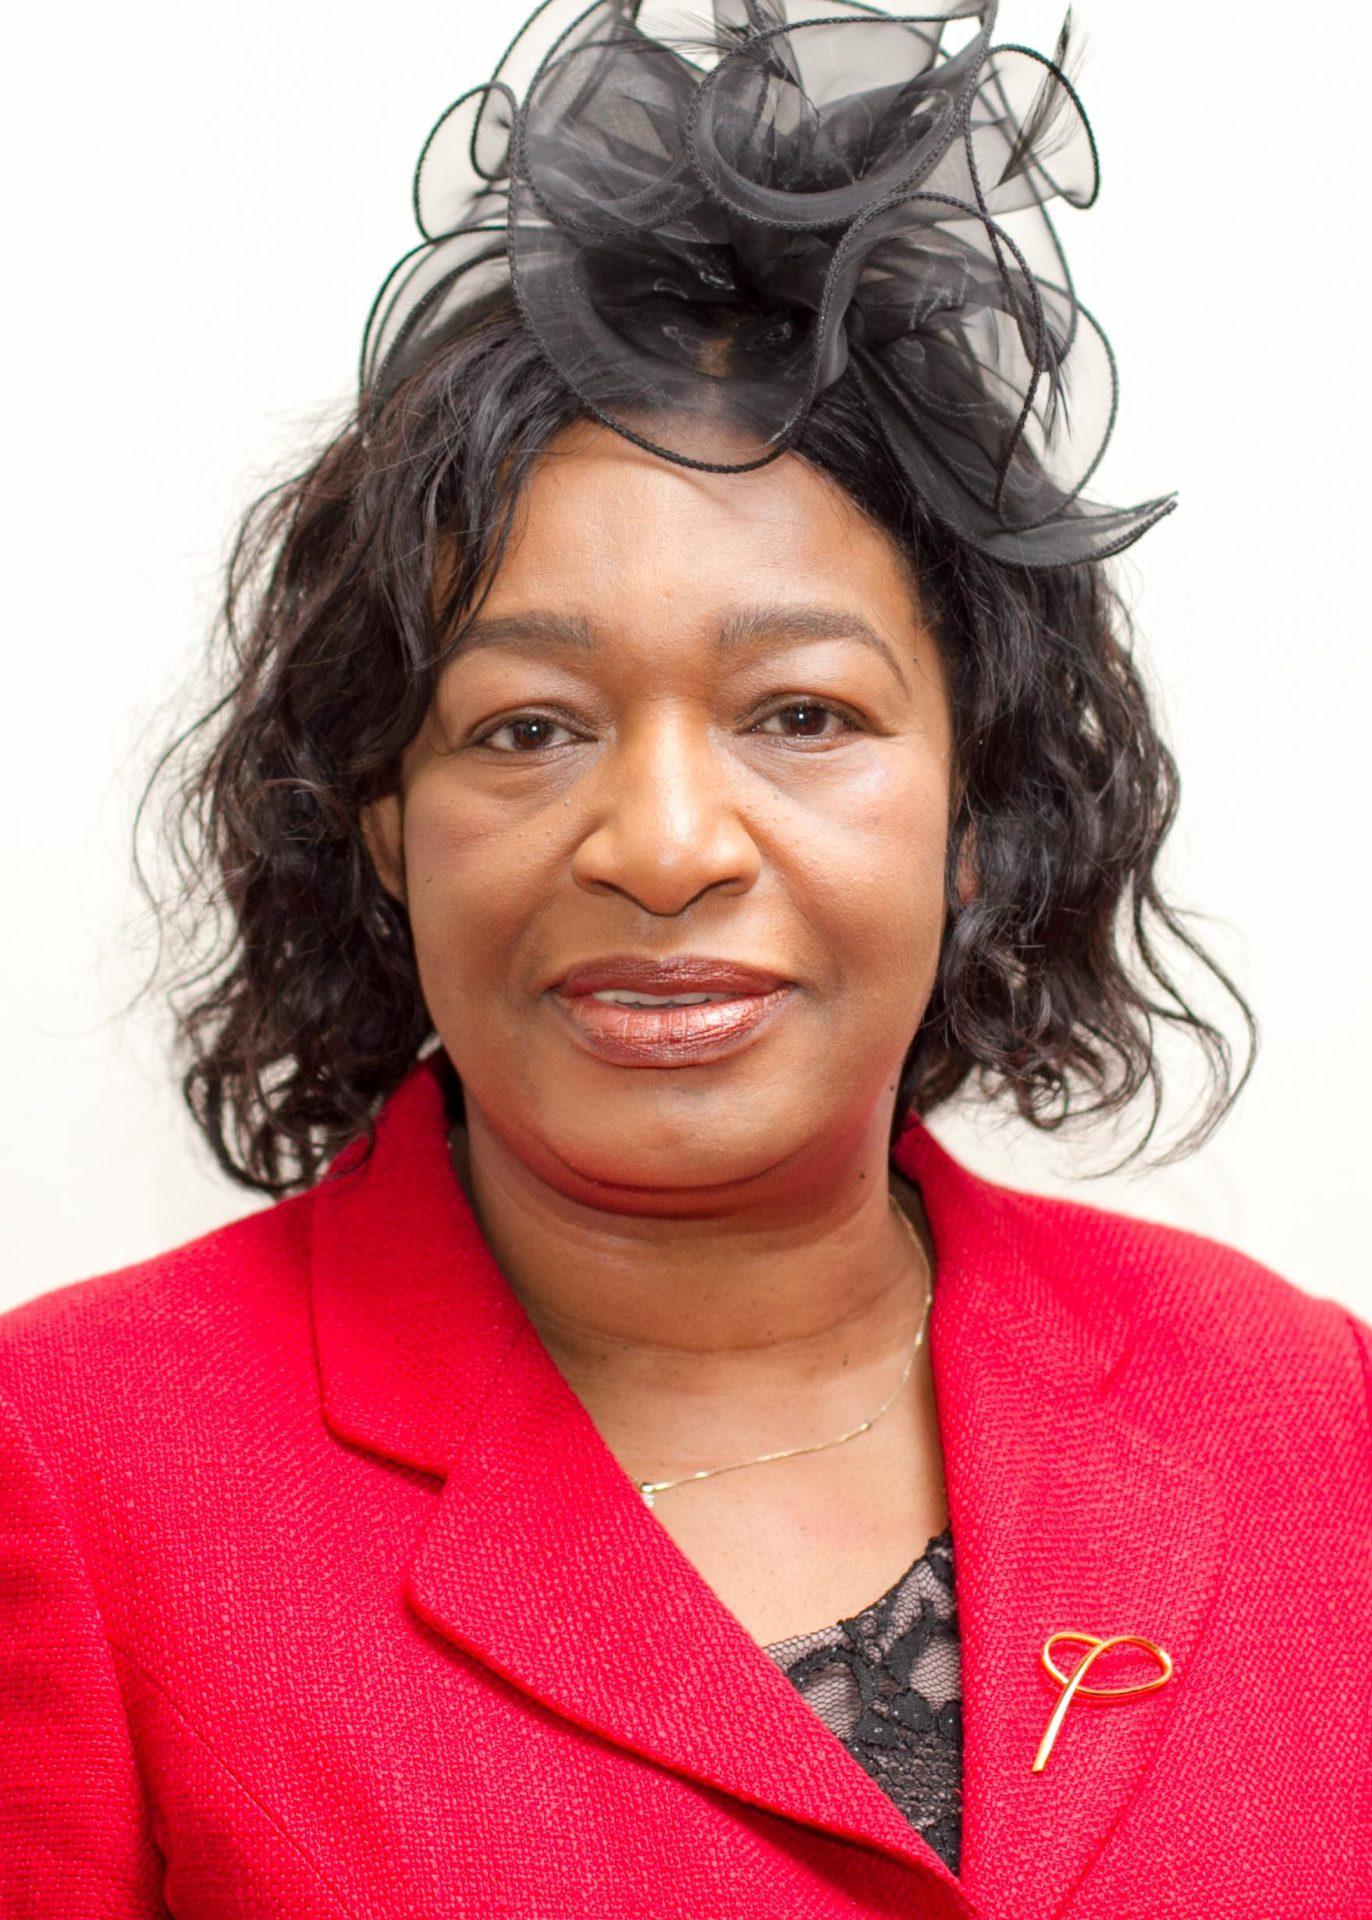 Deaconess Sharon Hastings